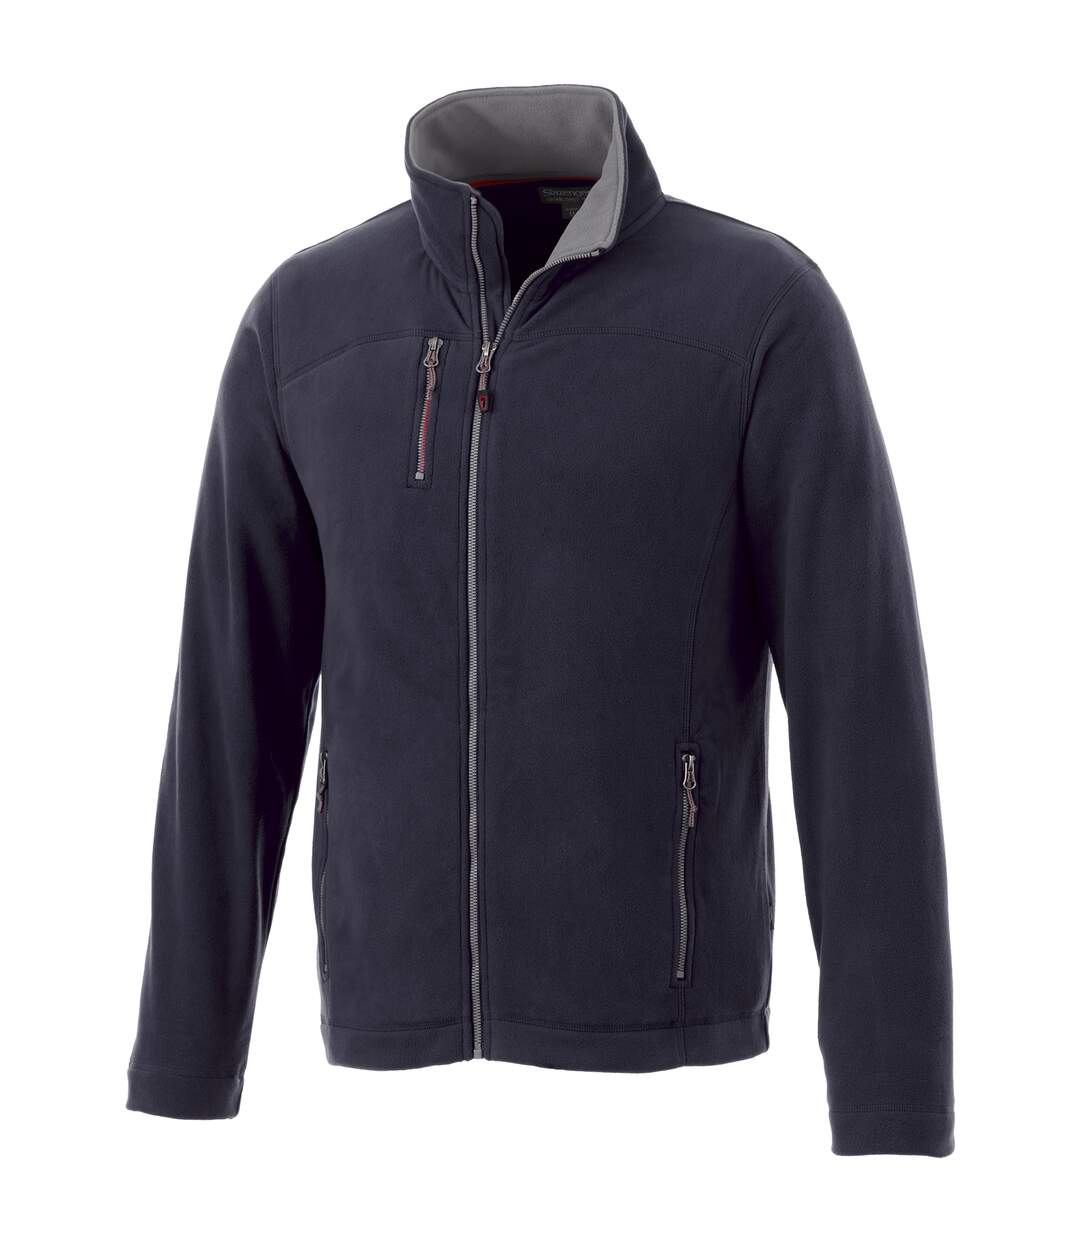 Slazenger Mens Pitch Microfleece Jacket (Red) - UTPF1797